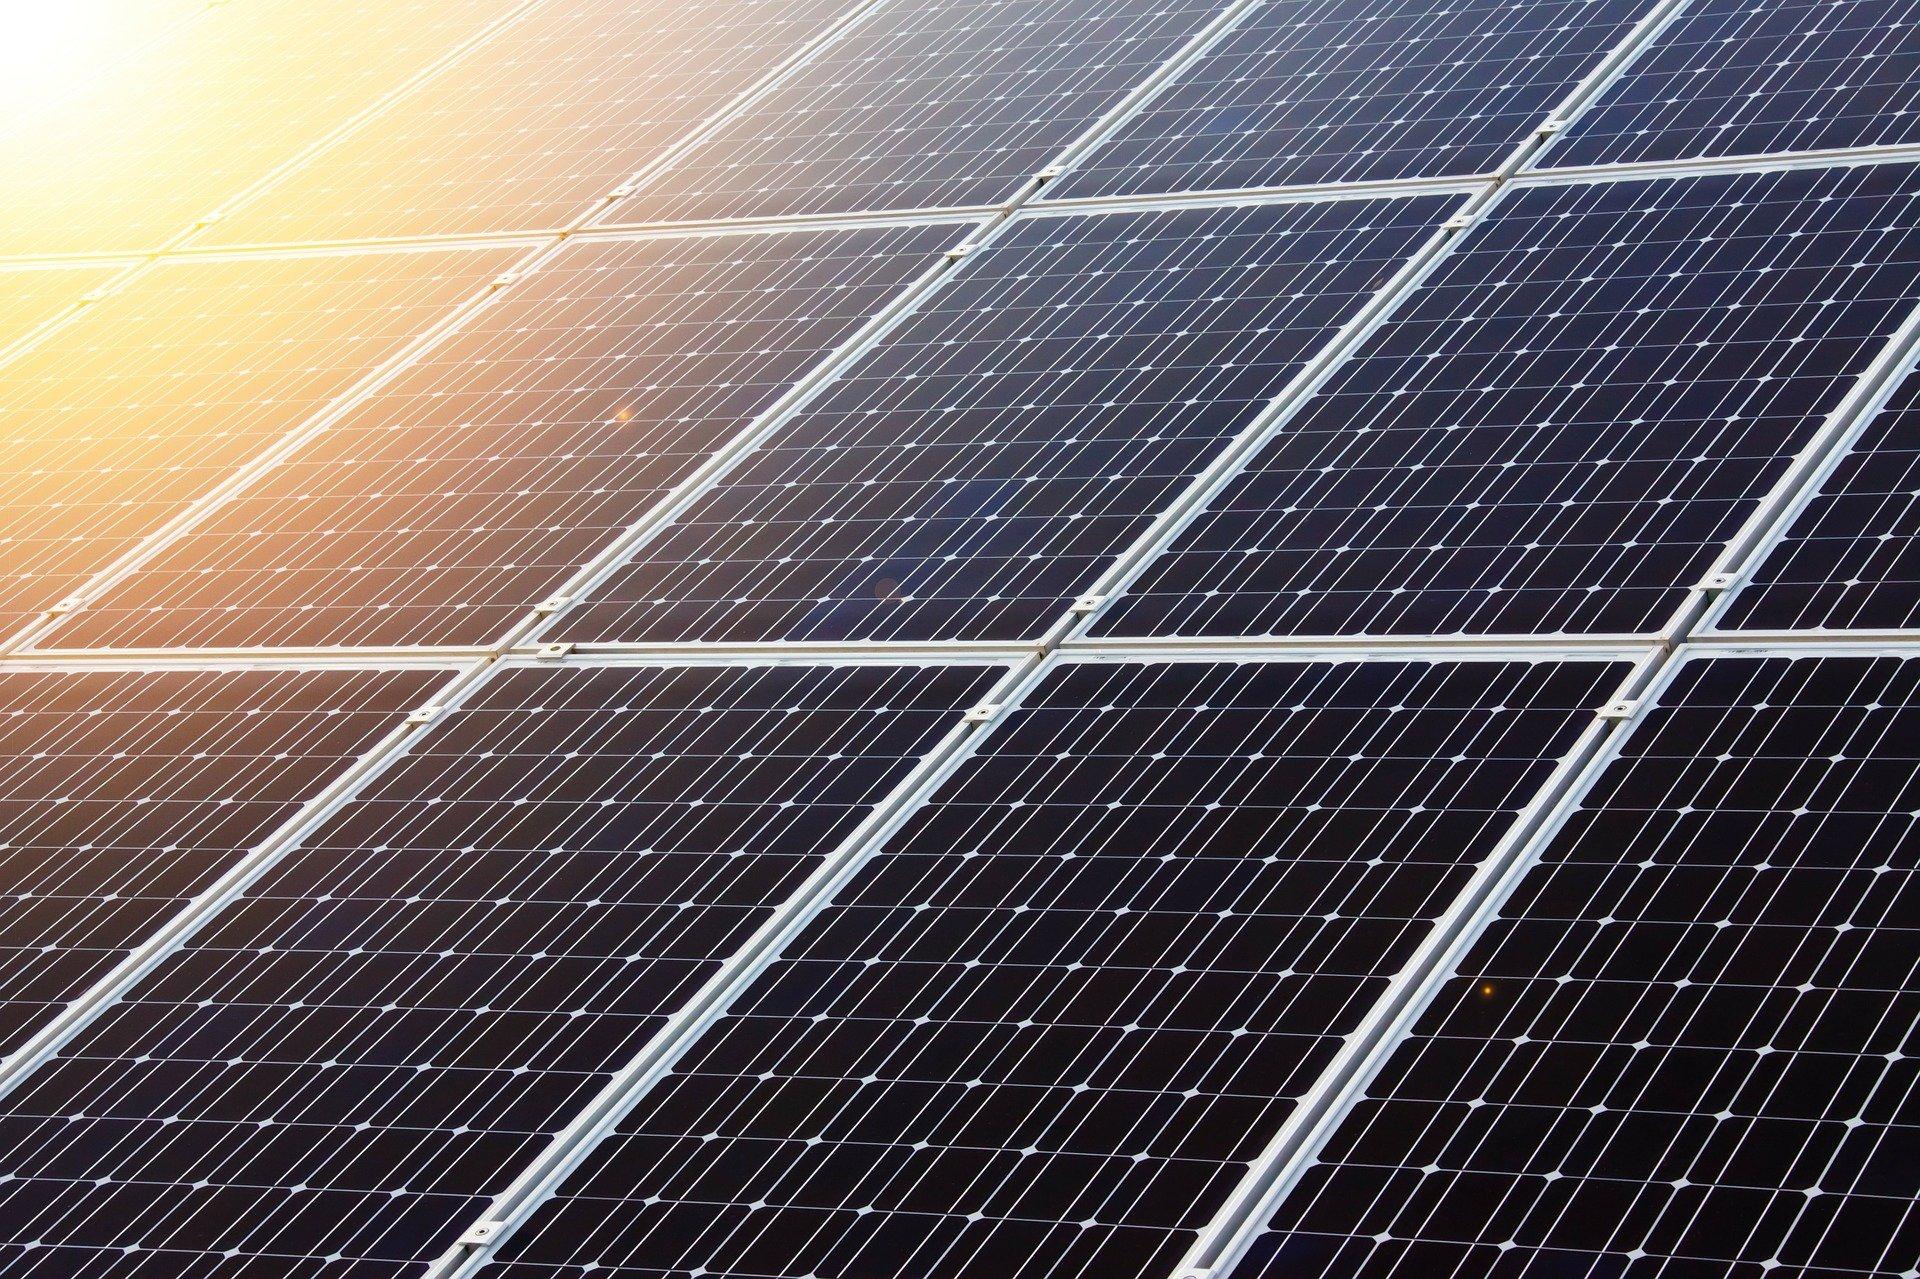 Solarstrom LED-Display